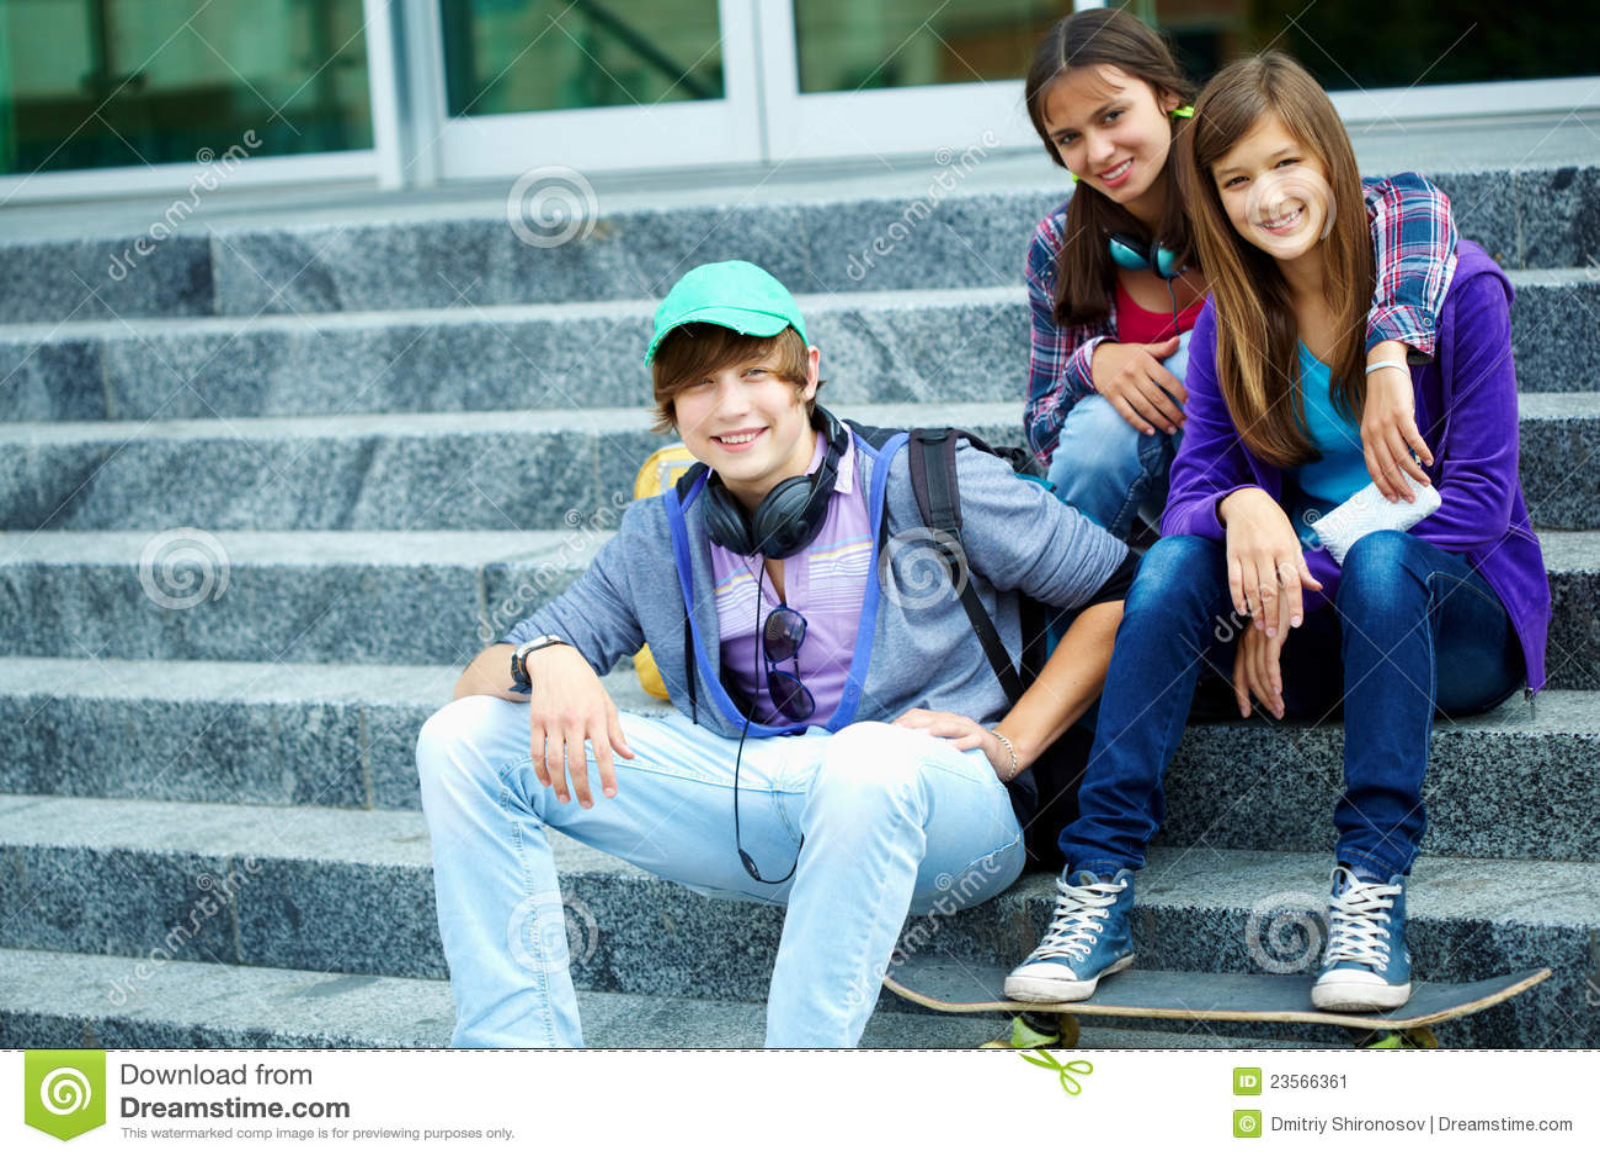 Jugendlich jugendlich Engel des Teenagers des Teenagers